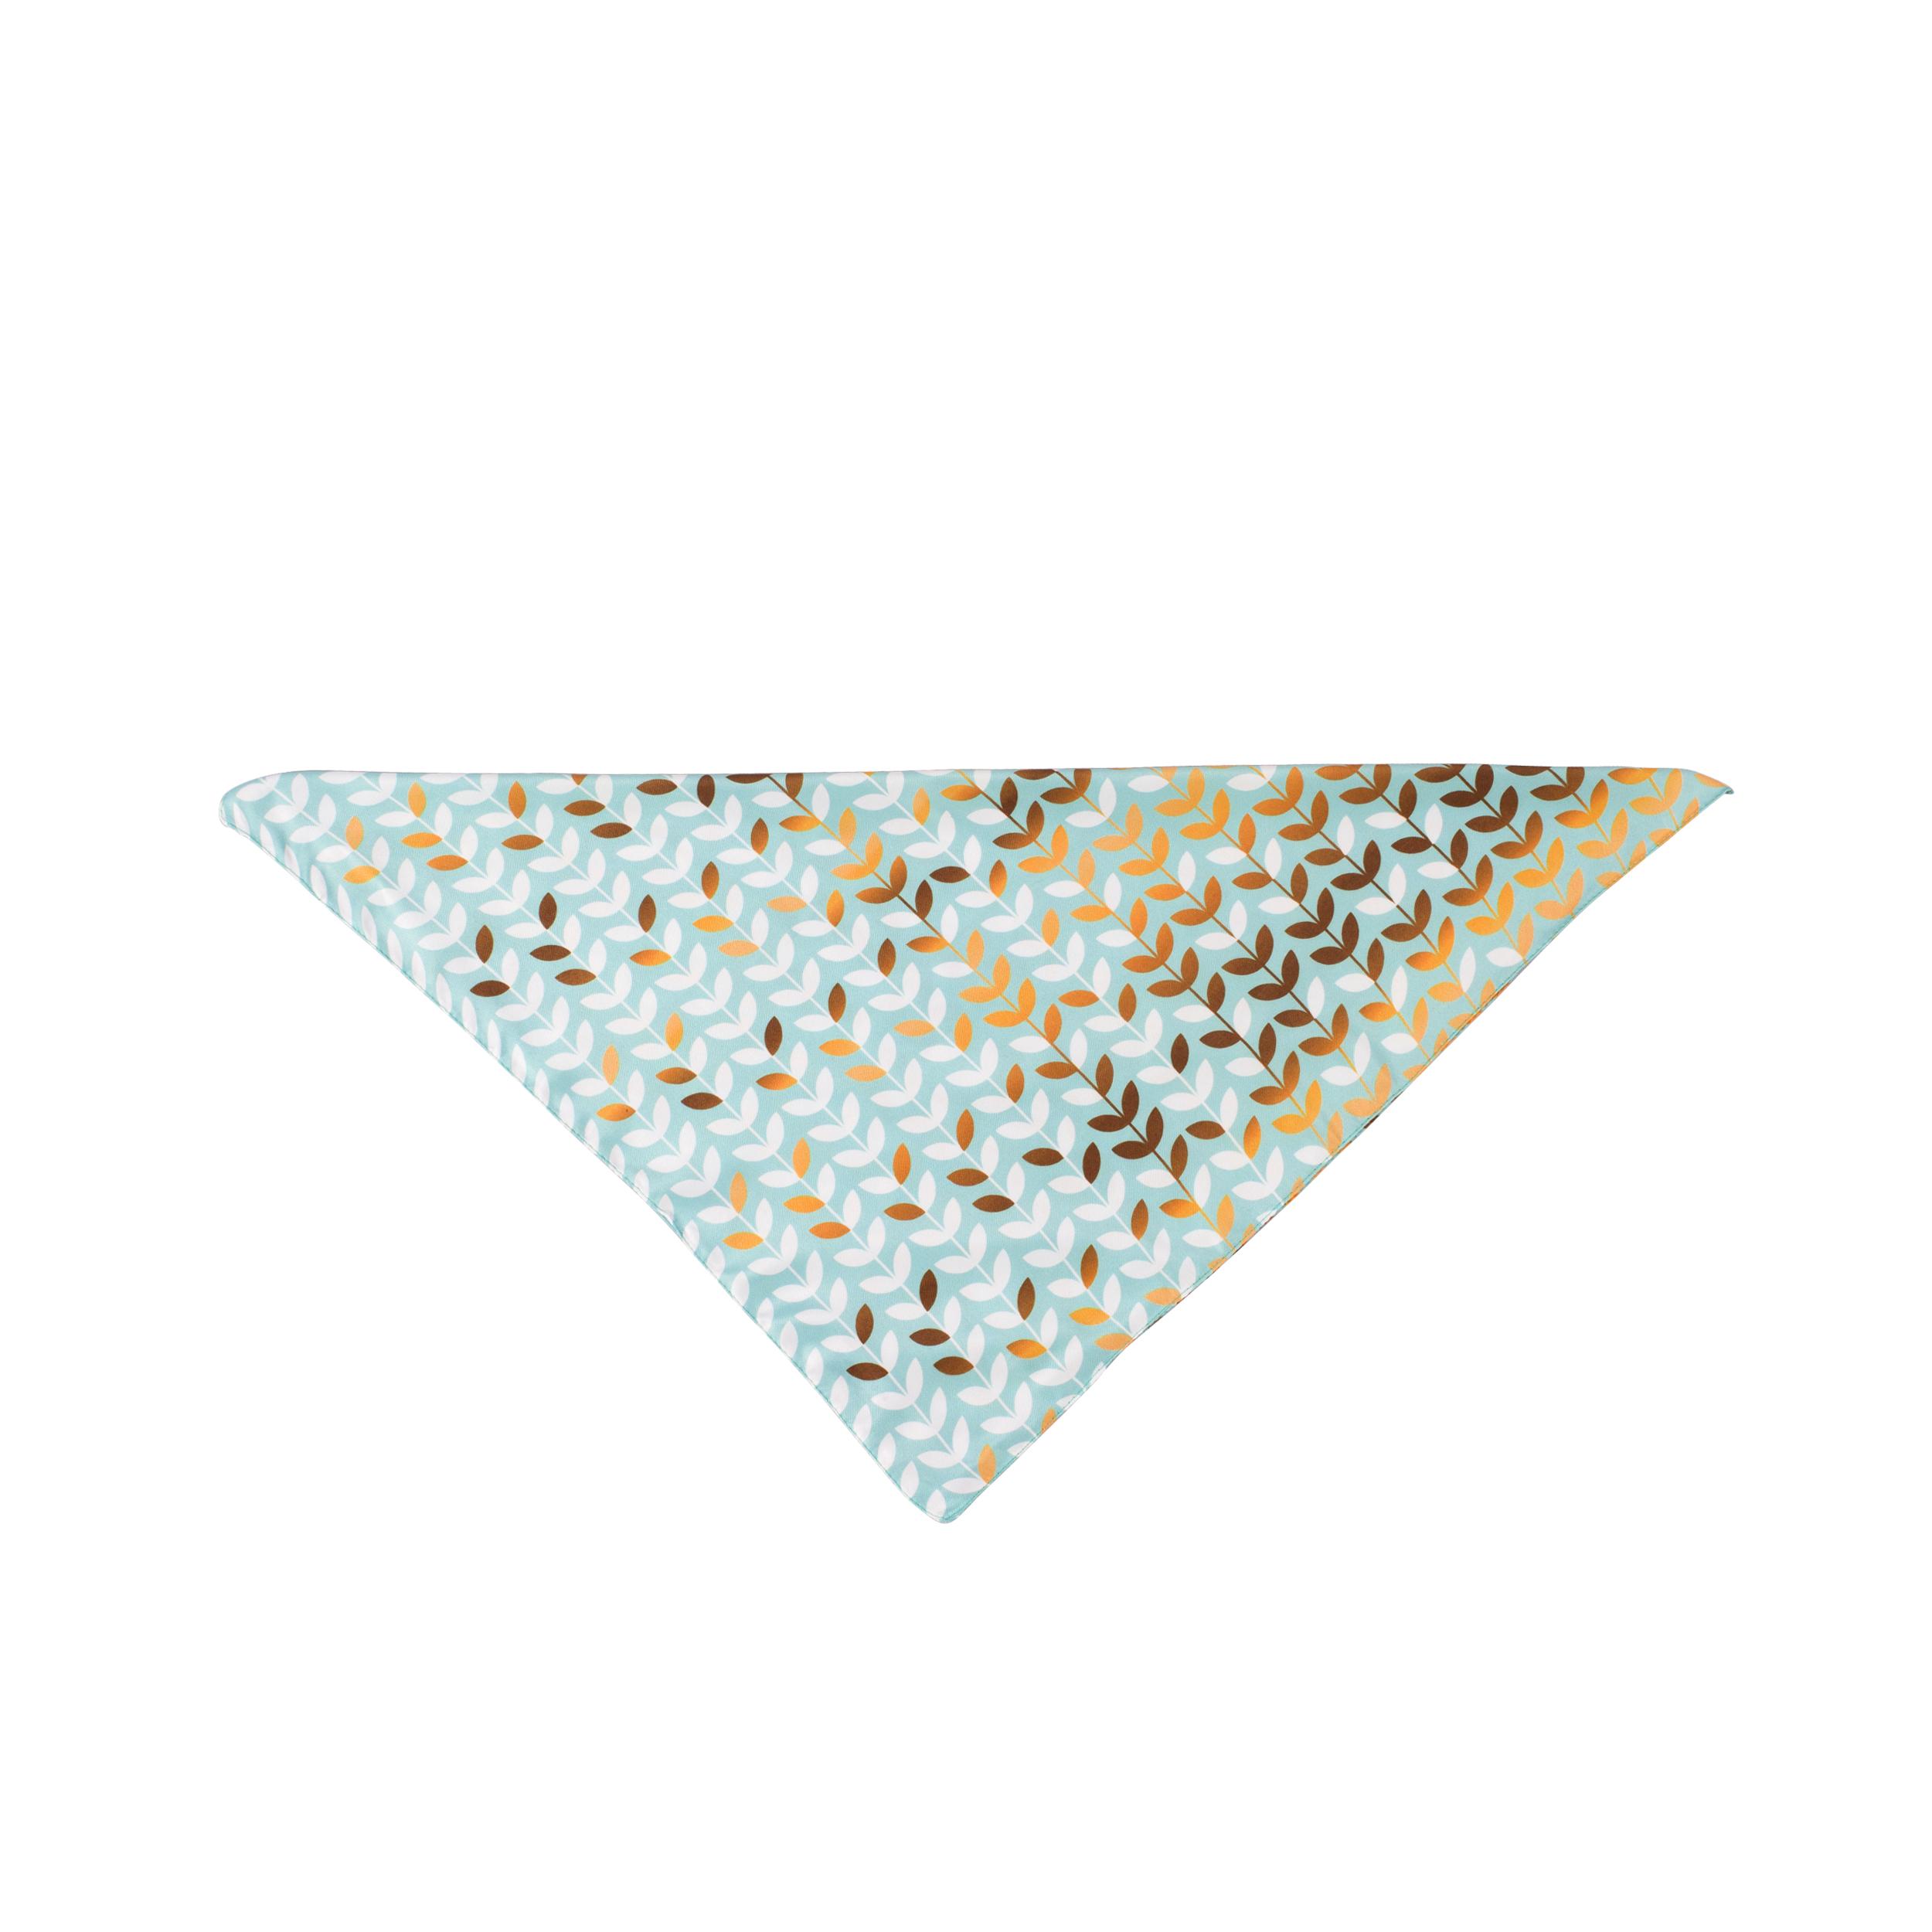 دستمال گردن زنانه نسیما کد N 117